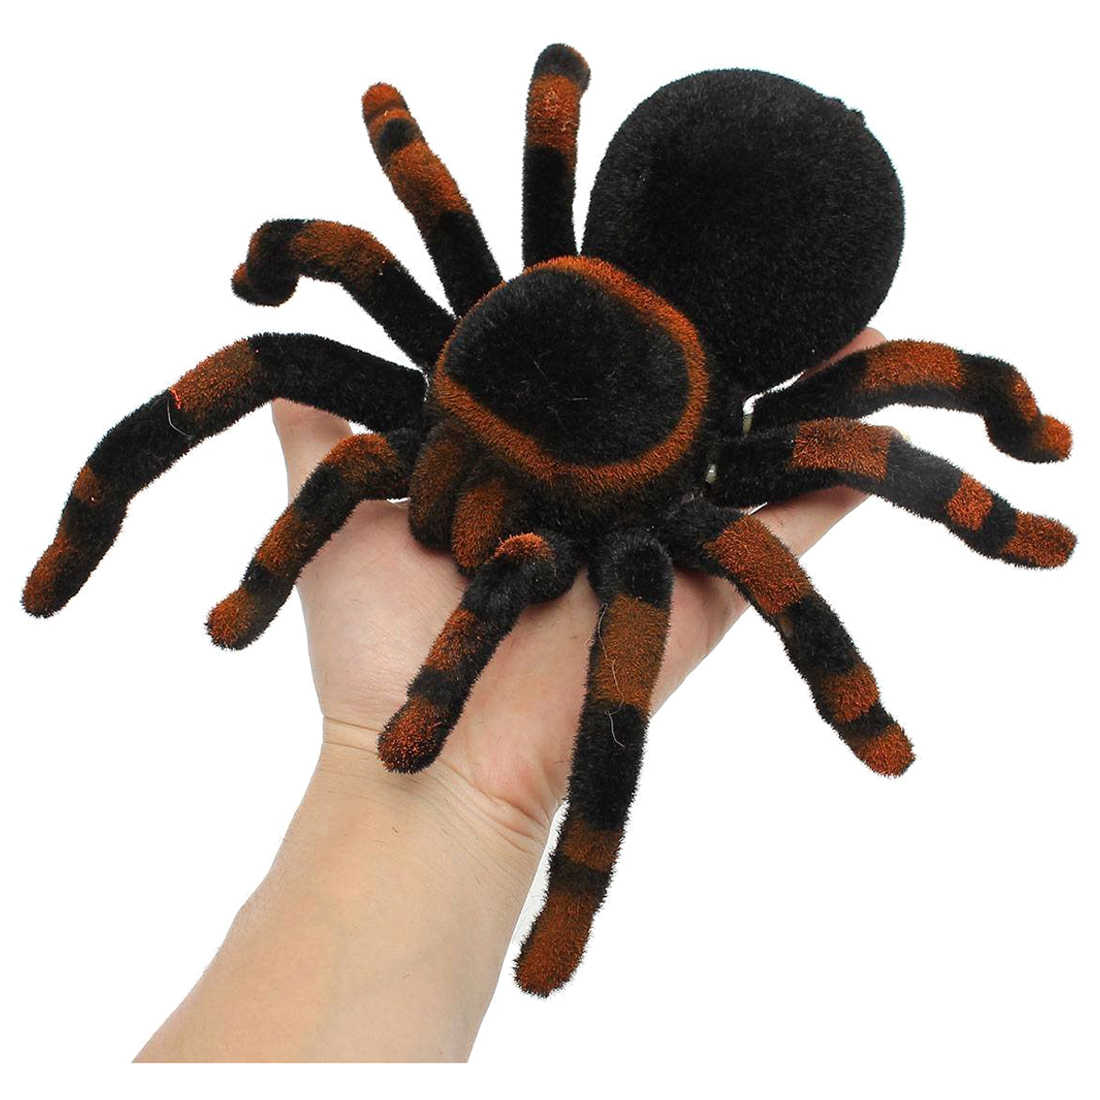 "Abwe Terbaik Sale 8 ""RC Remote Control Spider Remote Control Spider Mainan Hadiah Dekorasi Raksasa Laba-laba Tarantula"